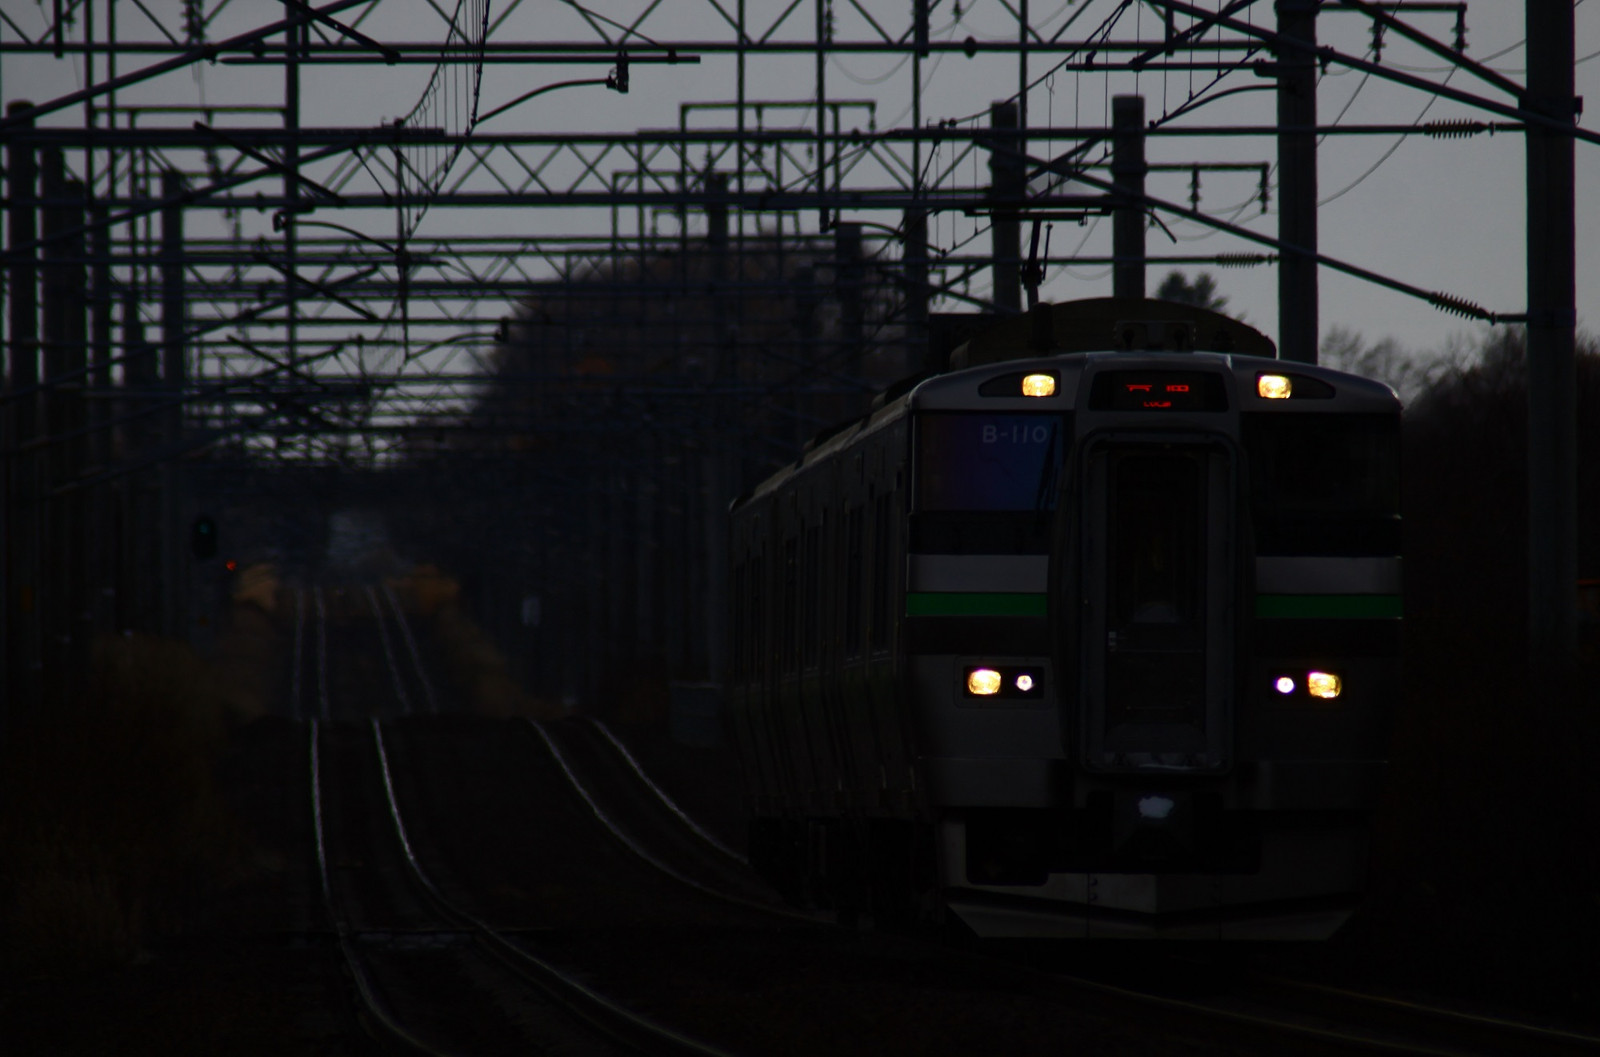 Jr1611233002